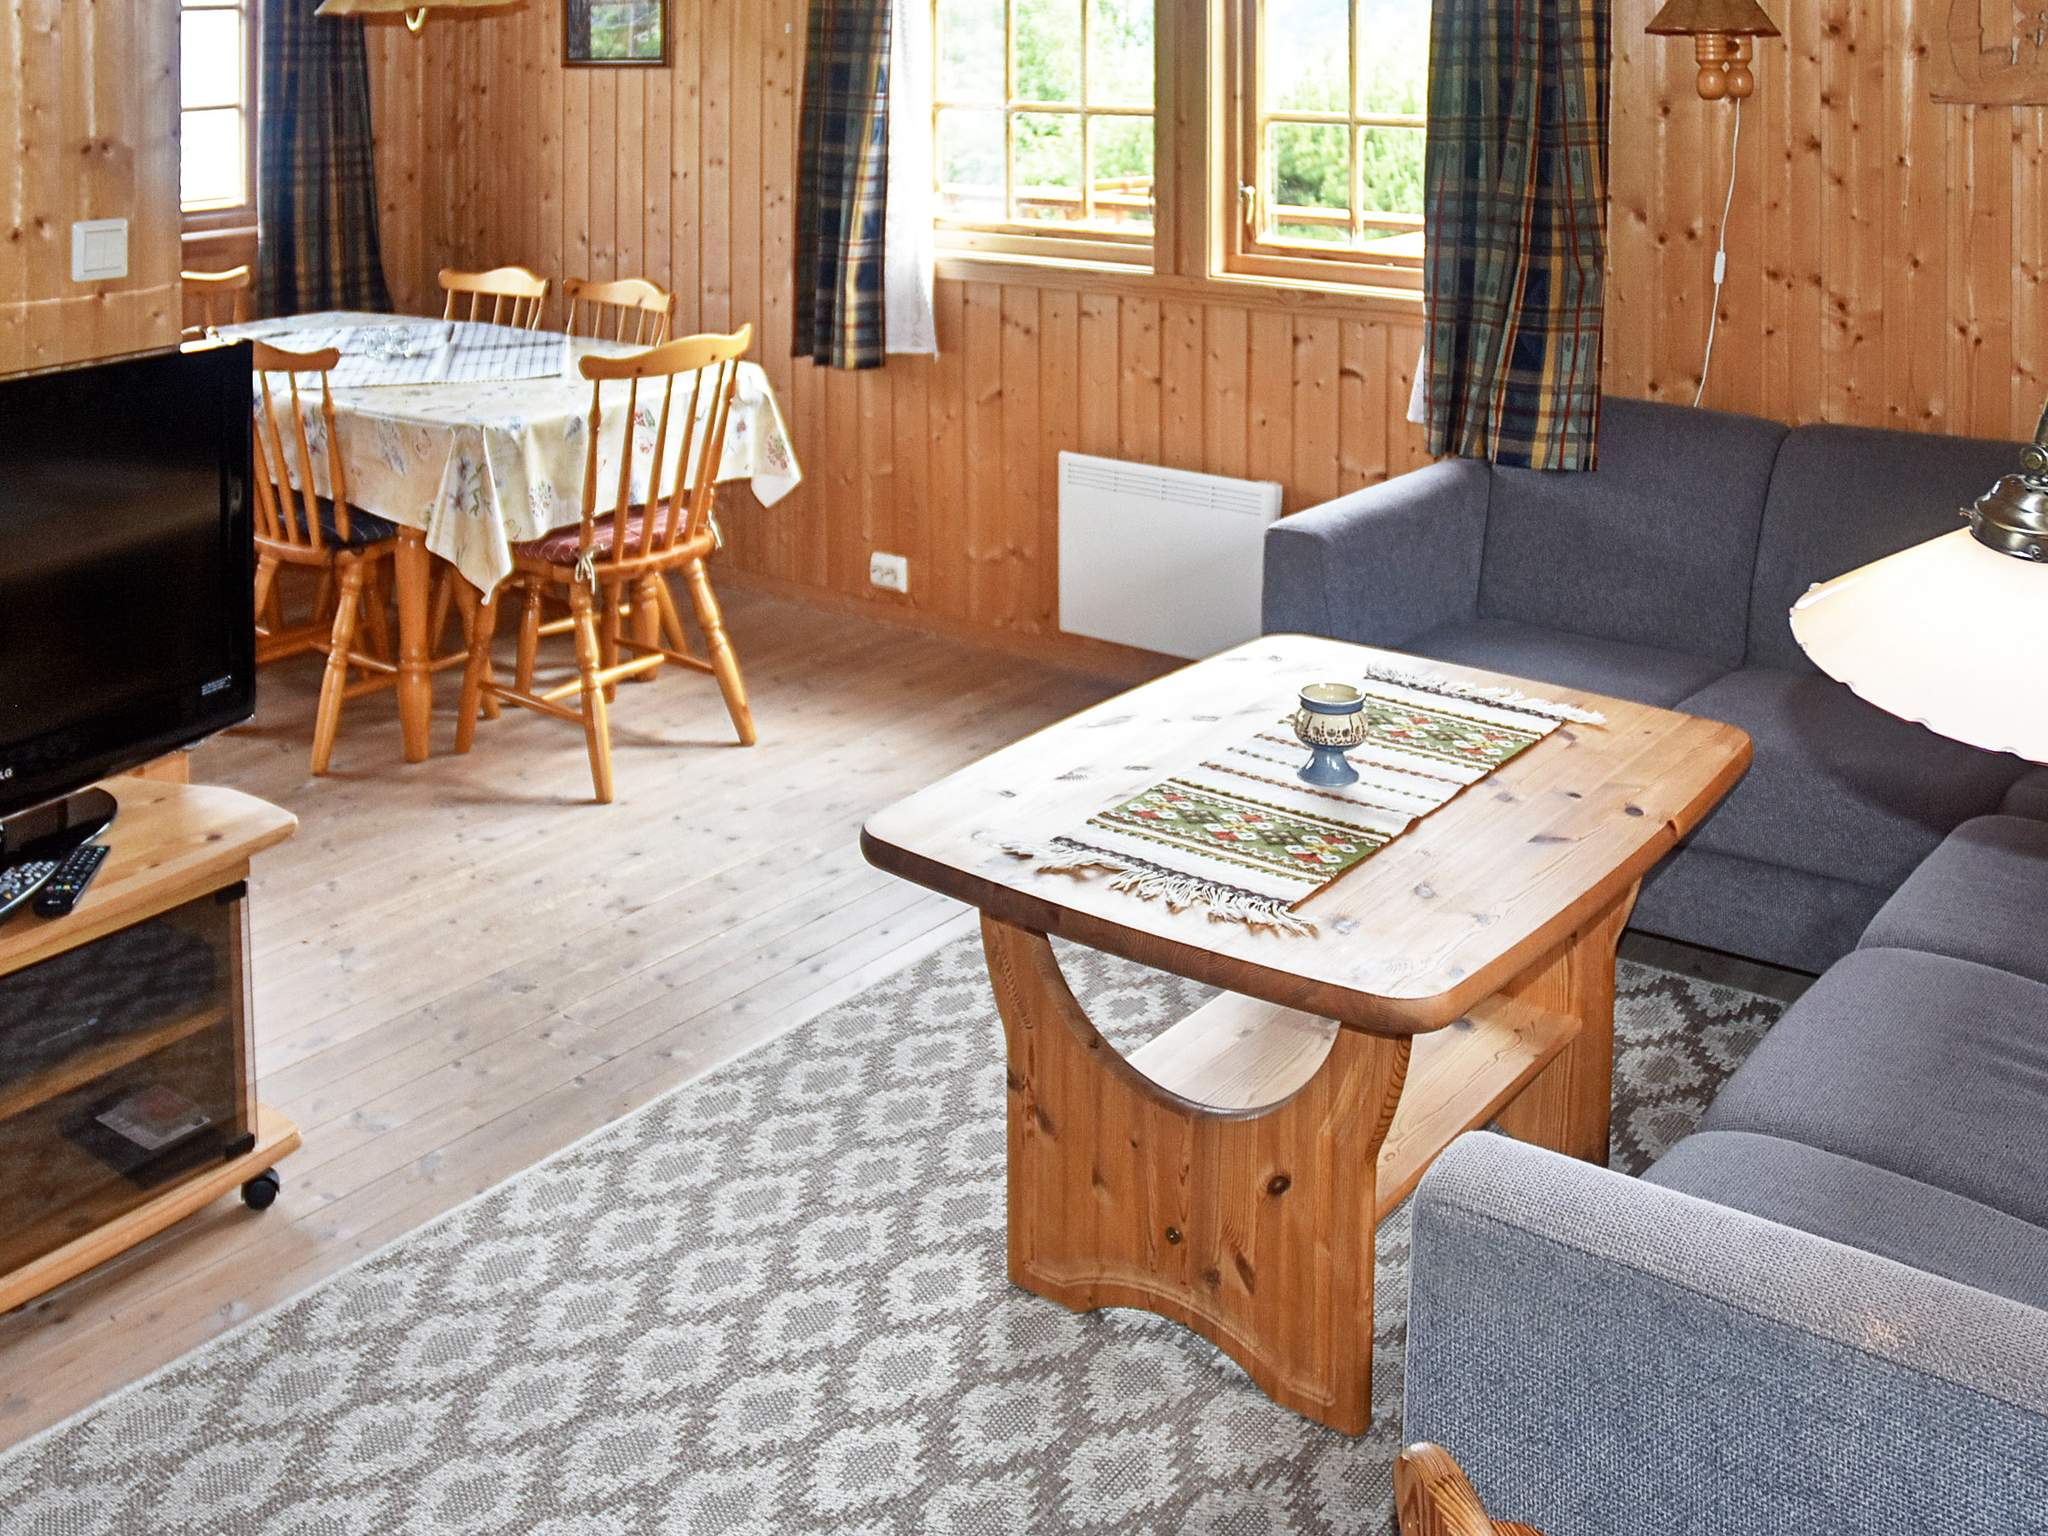 Ferienhaus Tistam (84697), Utvik, Sognefjord - Nordfjord, Westnorwegen, Norwegen, Bild 2